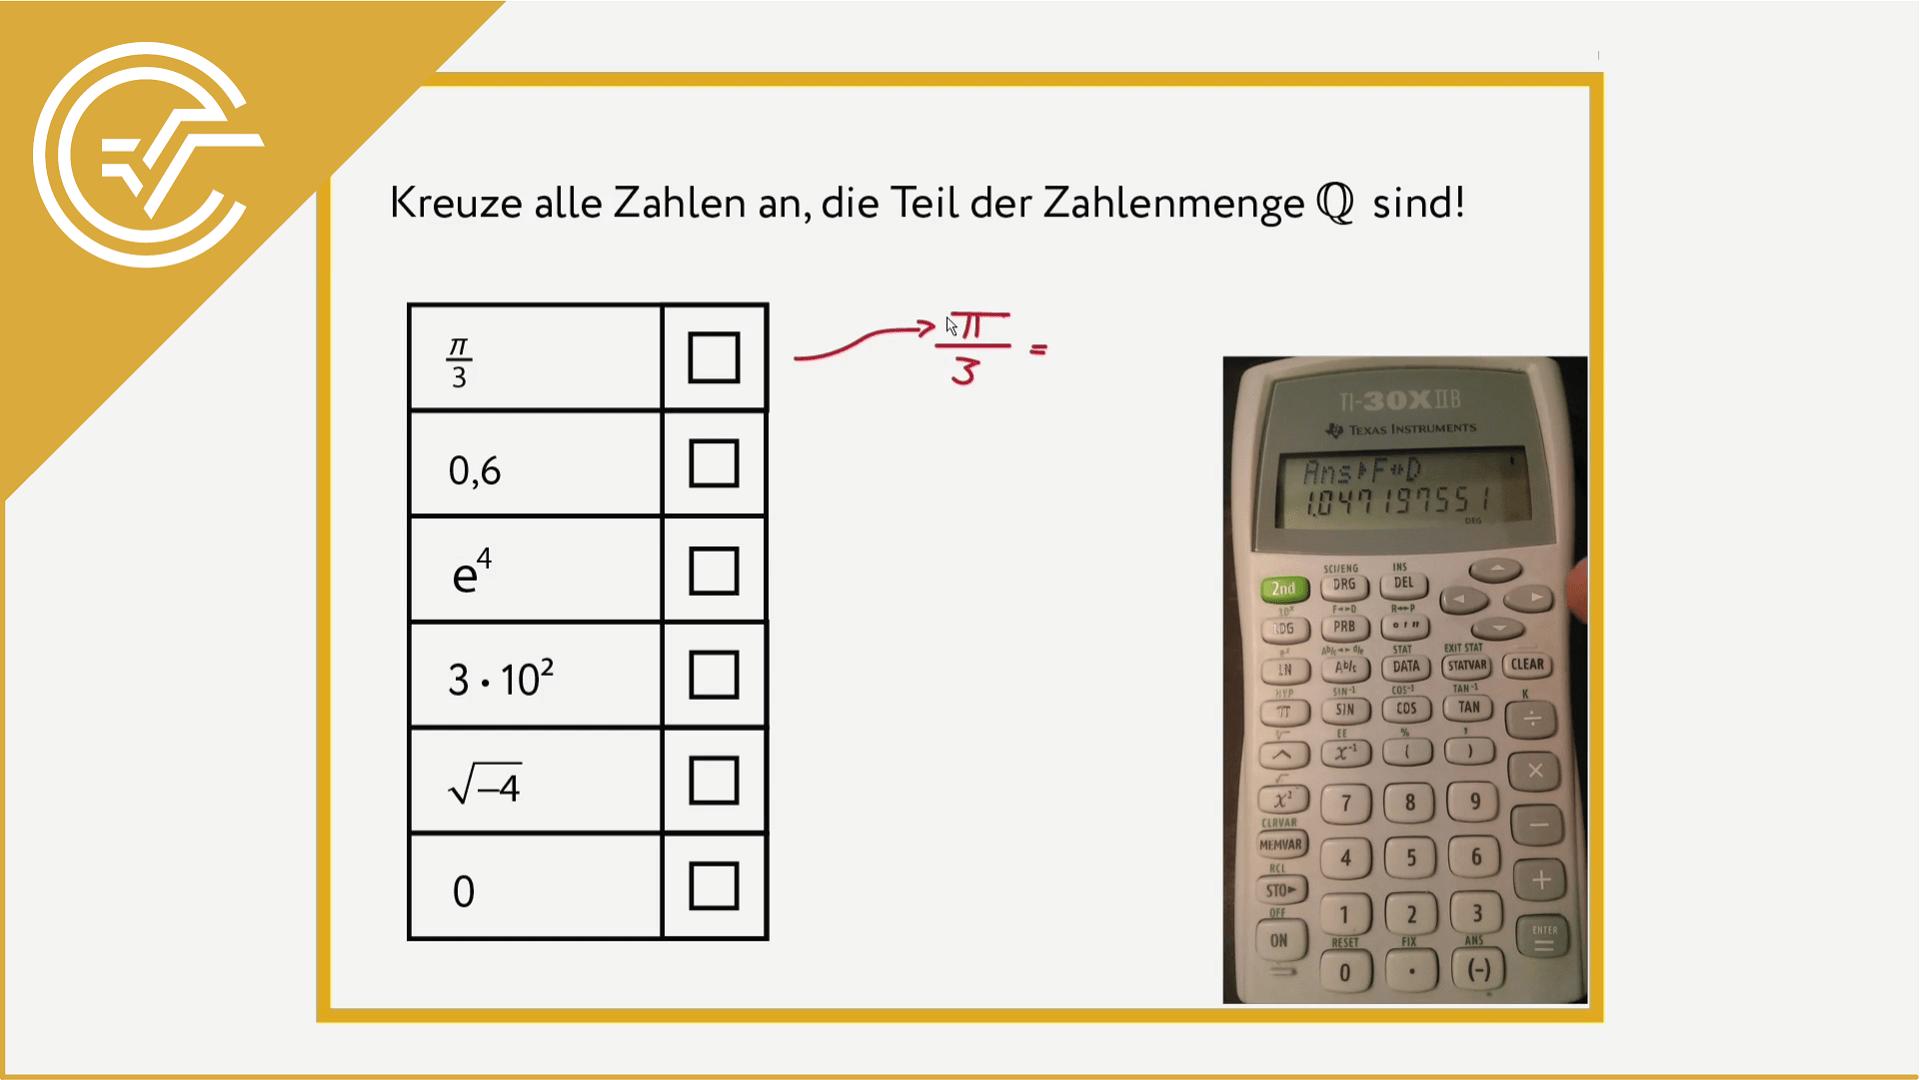 AG 1.1 - Zahlenmengen verstehen 1